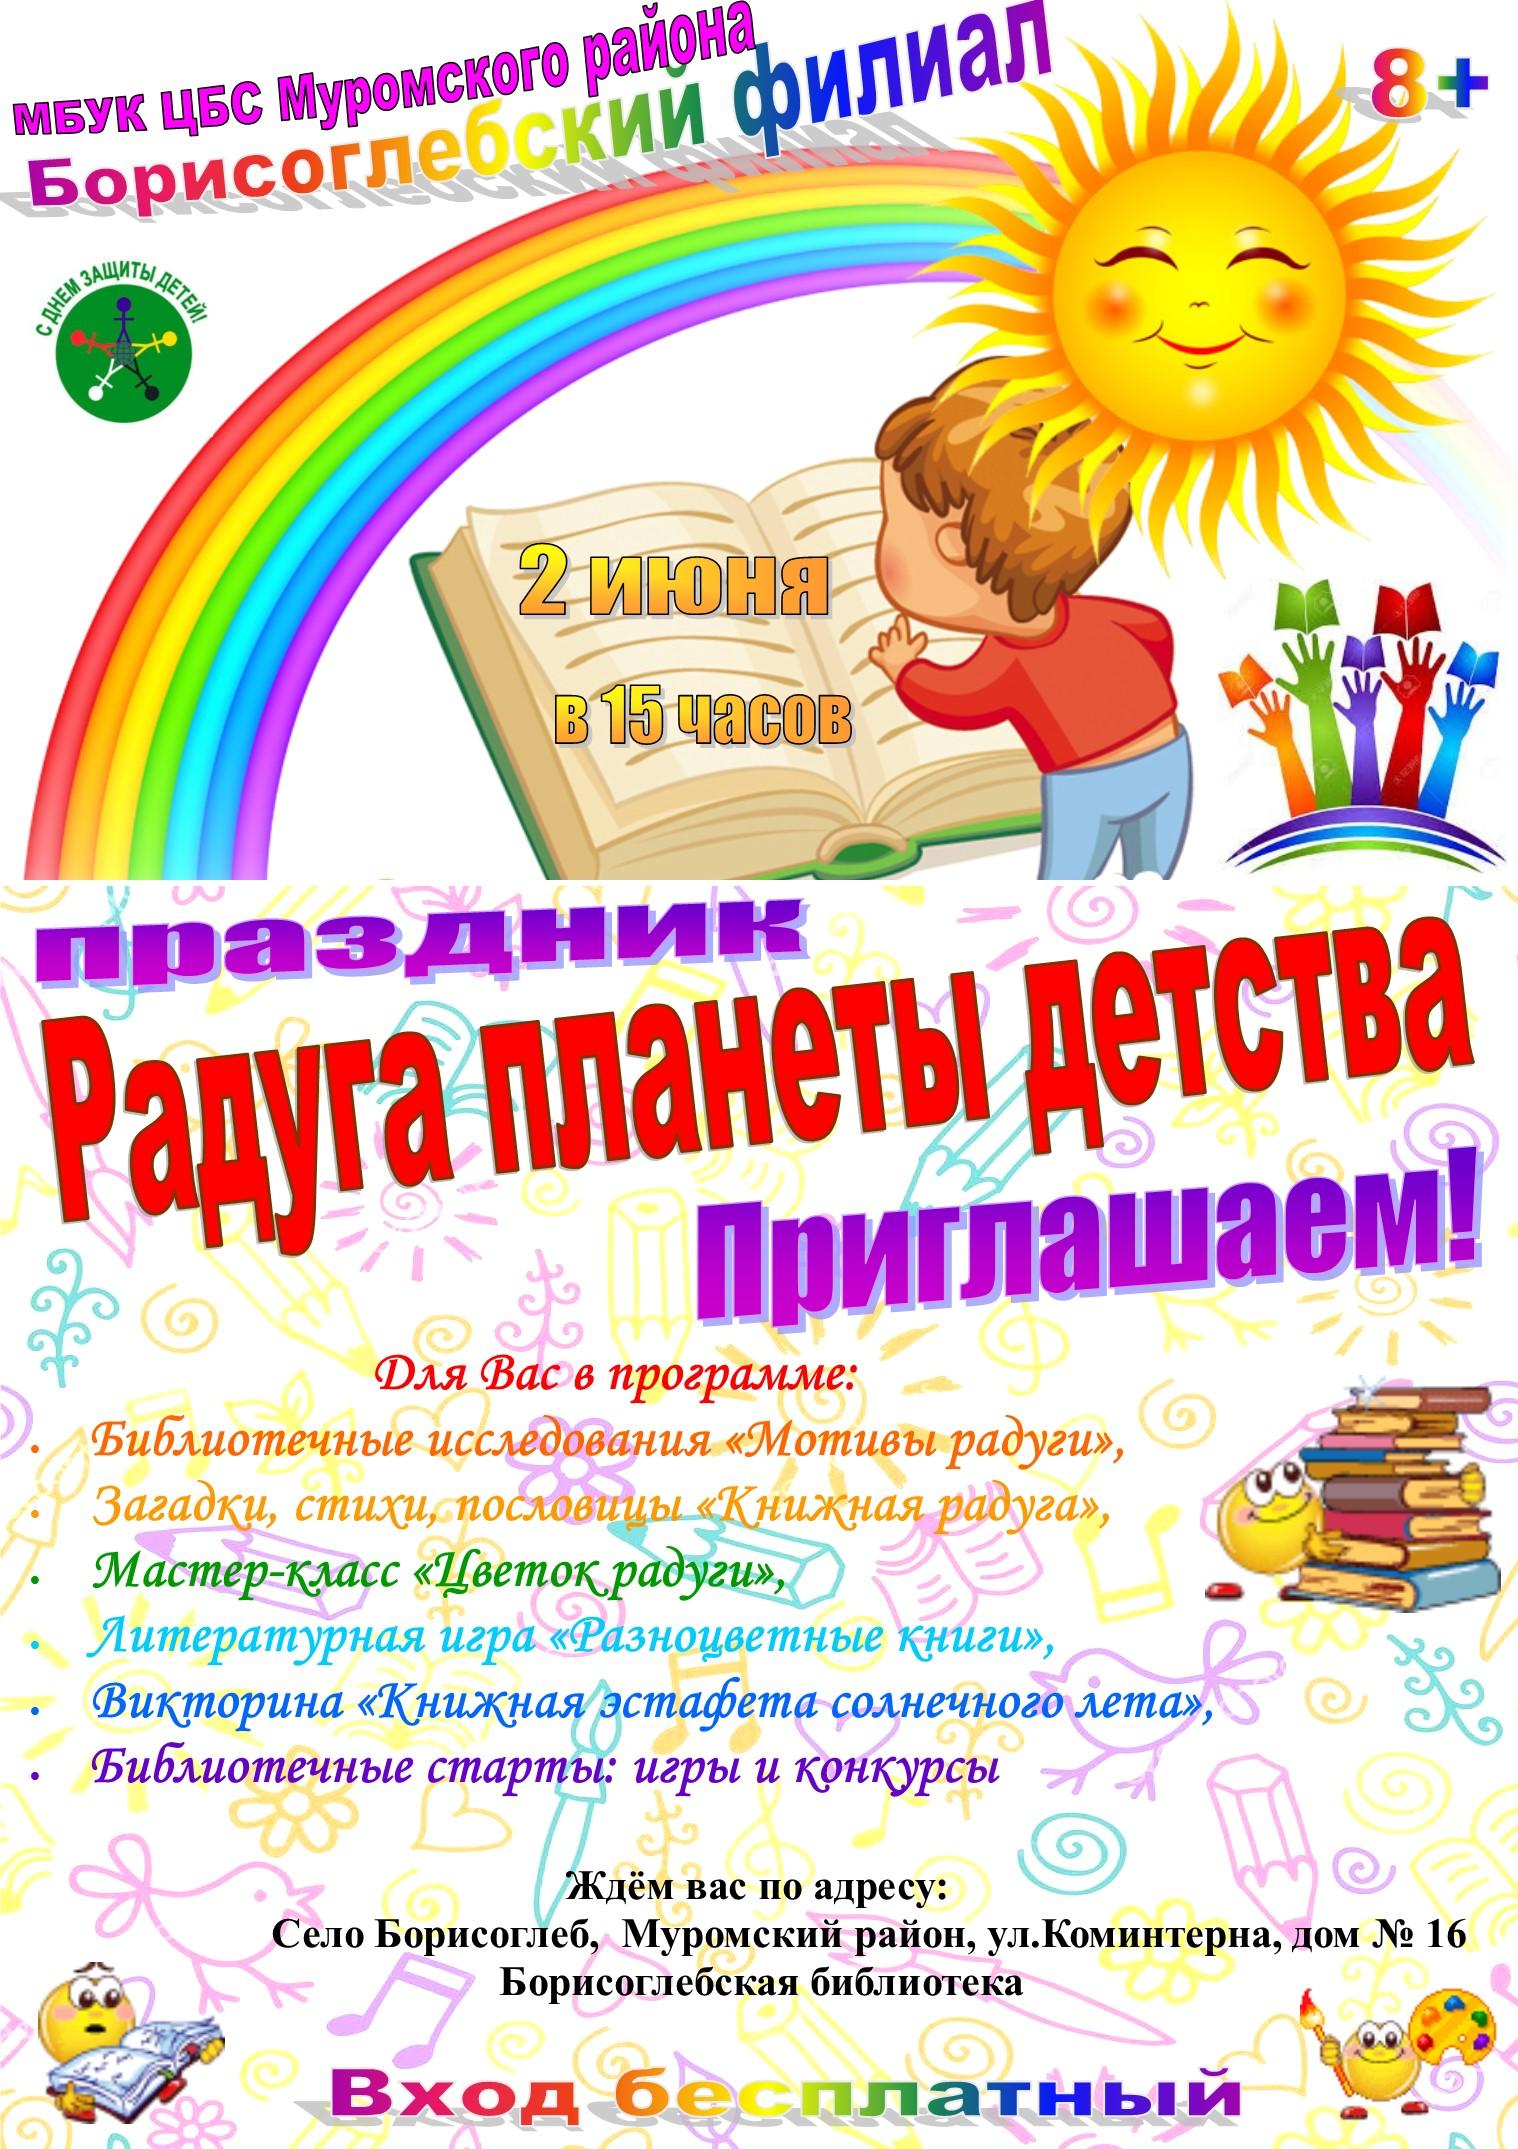 афиша детского праздника (1)